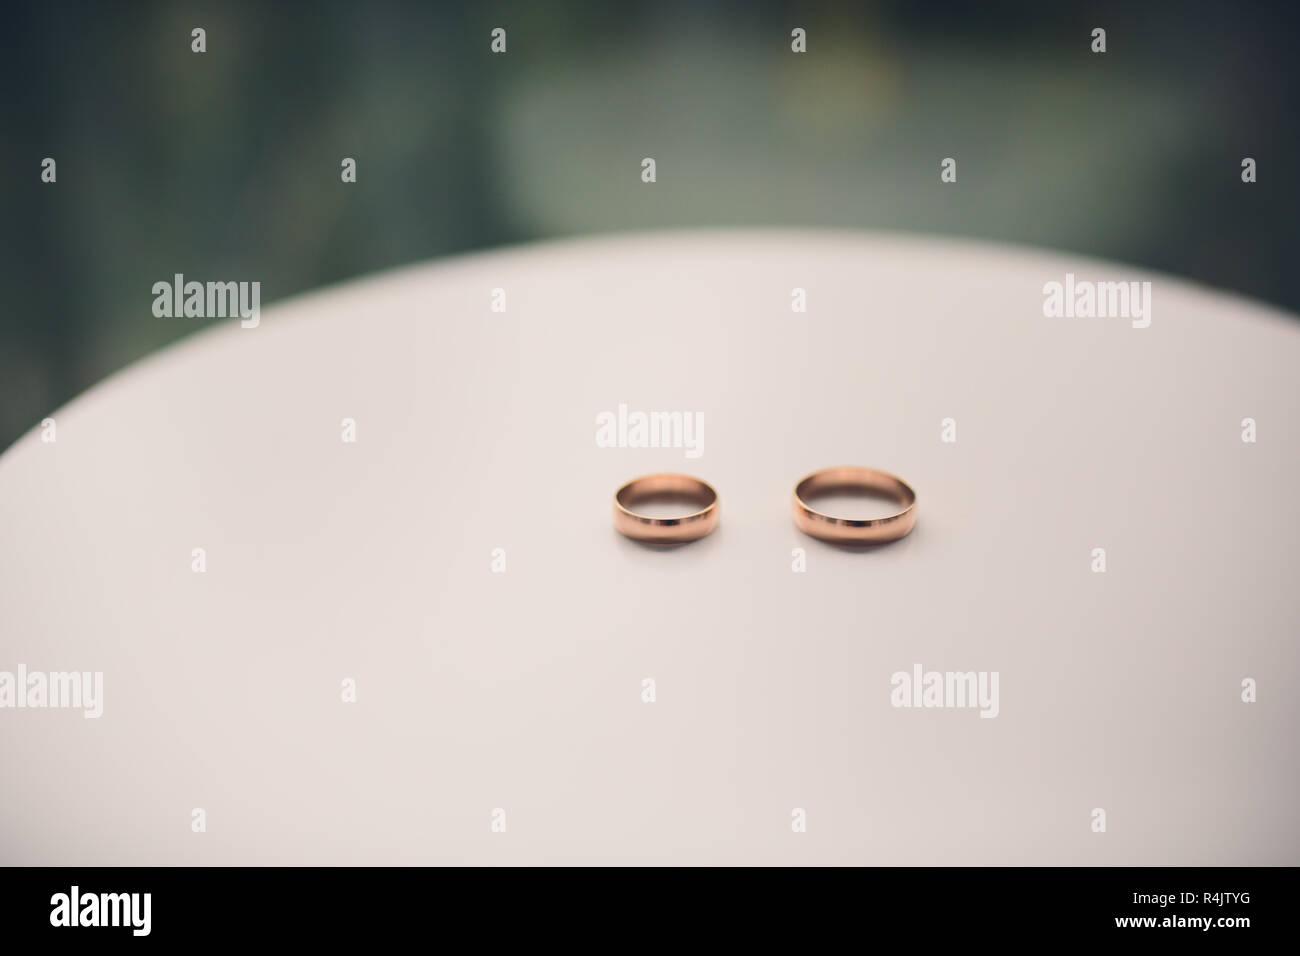 Wedding diamond gold rings engagement rings on white table. - Stock Image